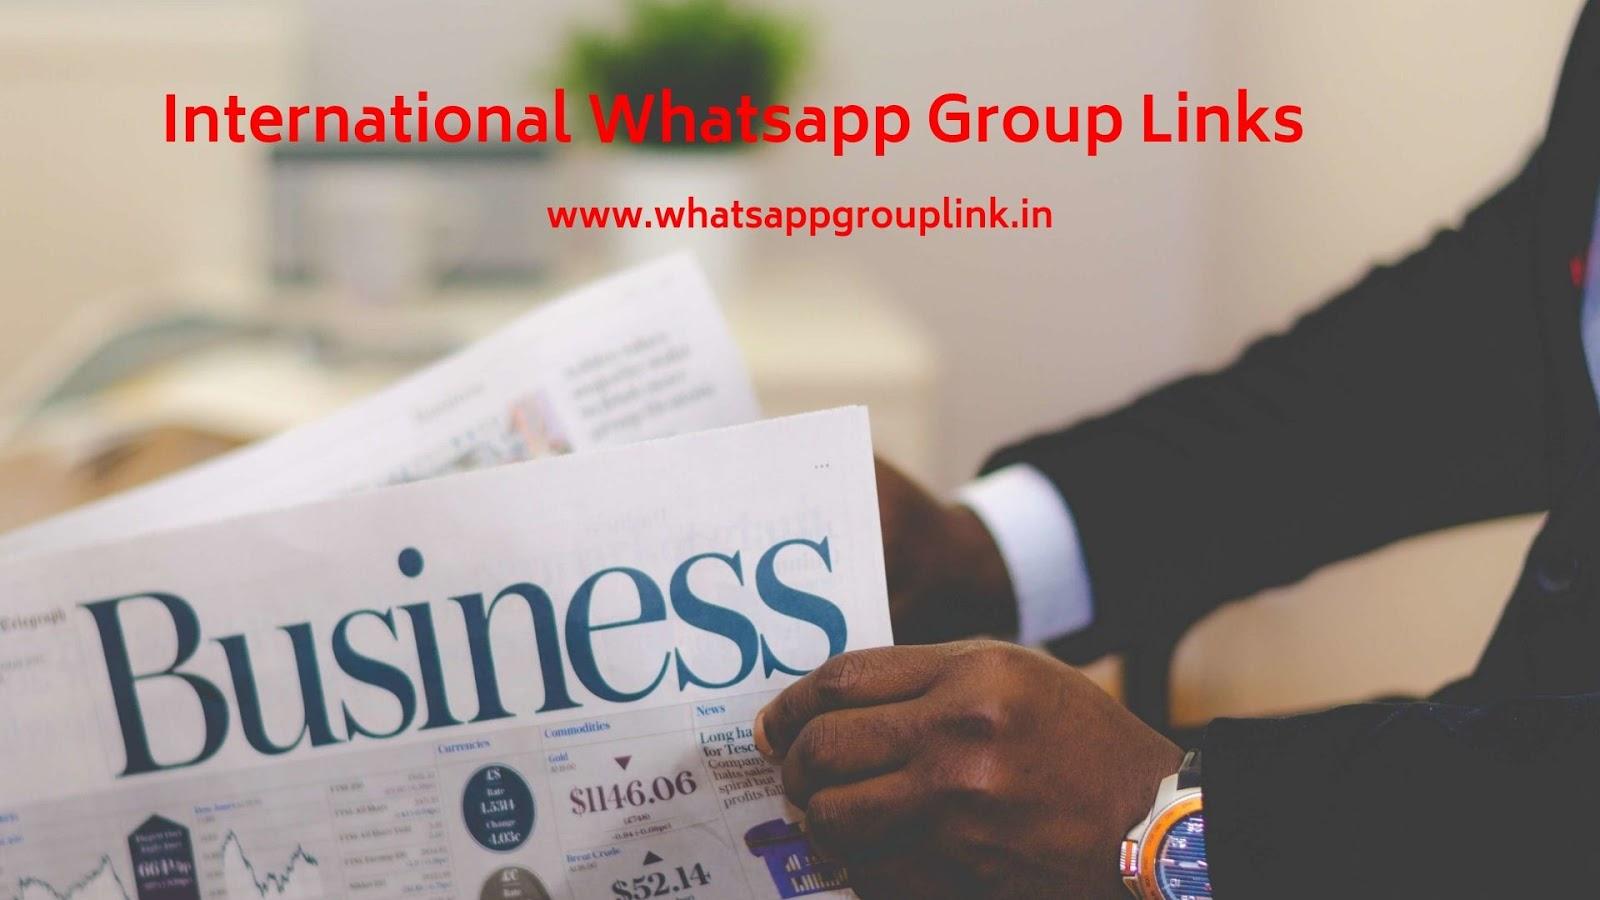 Whatsapp Group Link: International Whatsapp Group Links